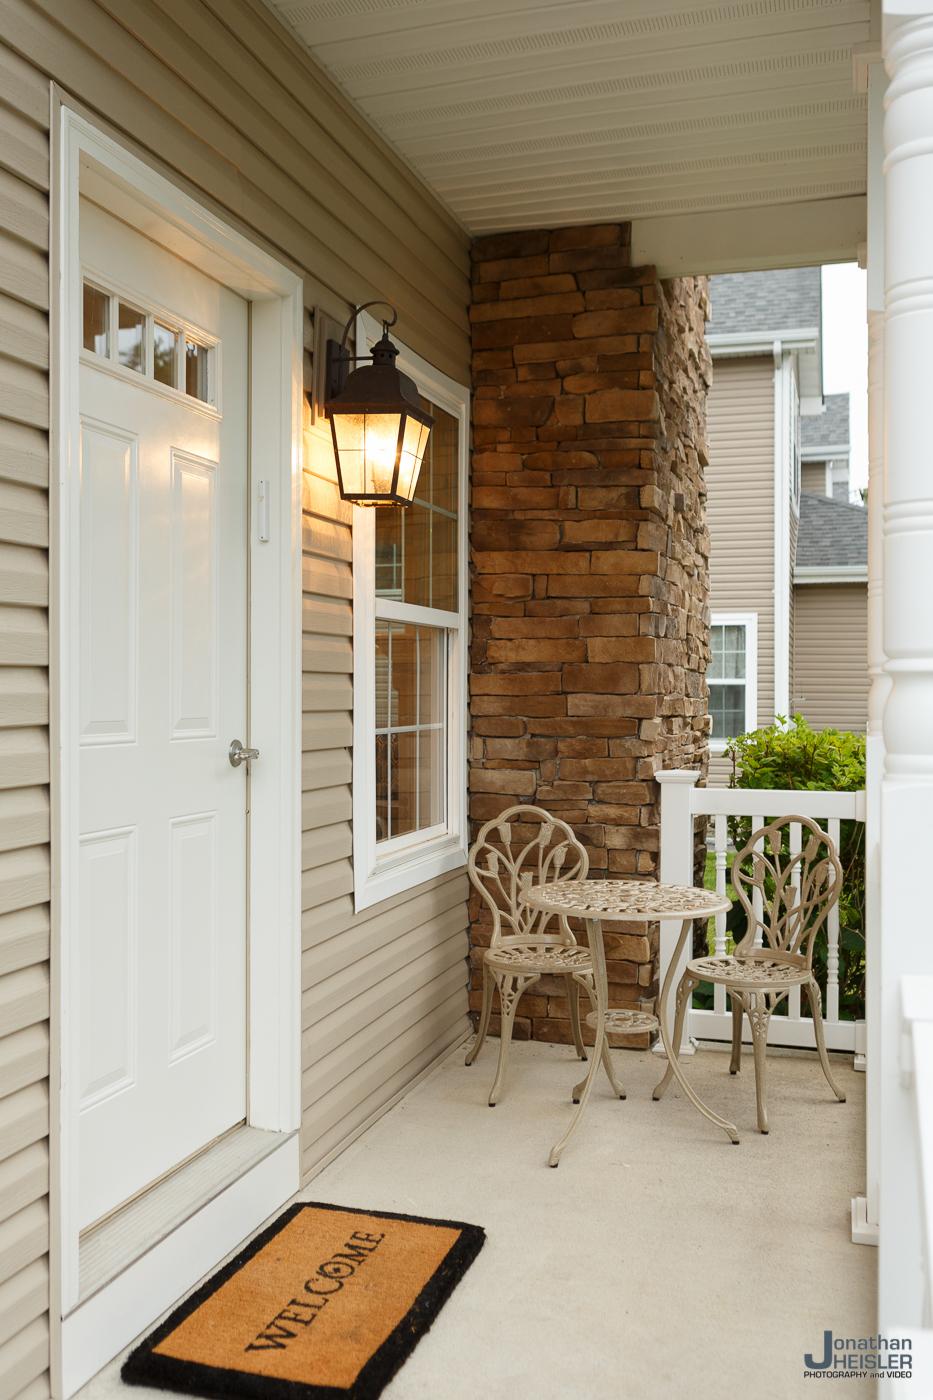 East Patchogue Condos_ Suffolk County Property__ Jonathan Heisler _ 014.jpg